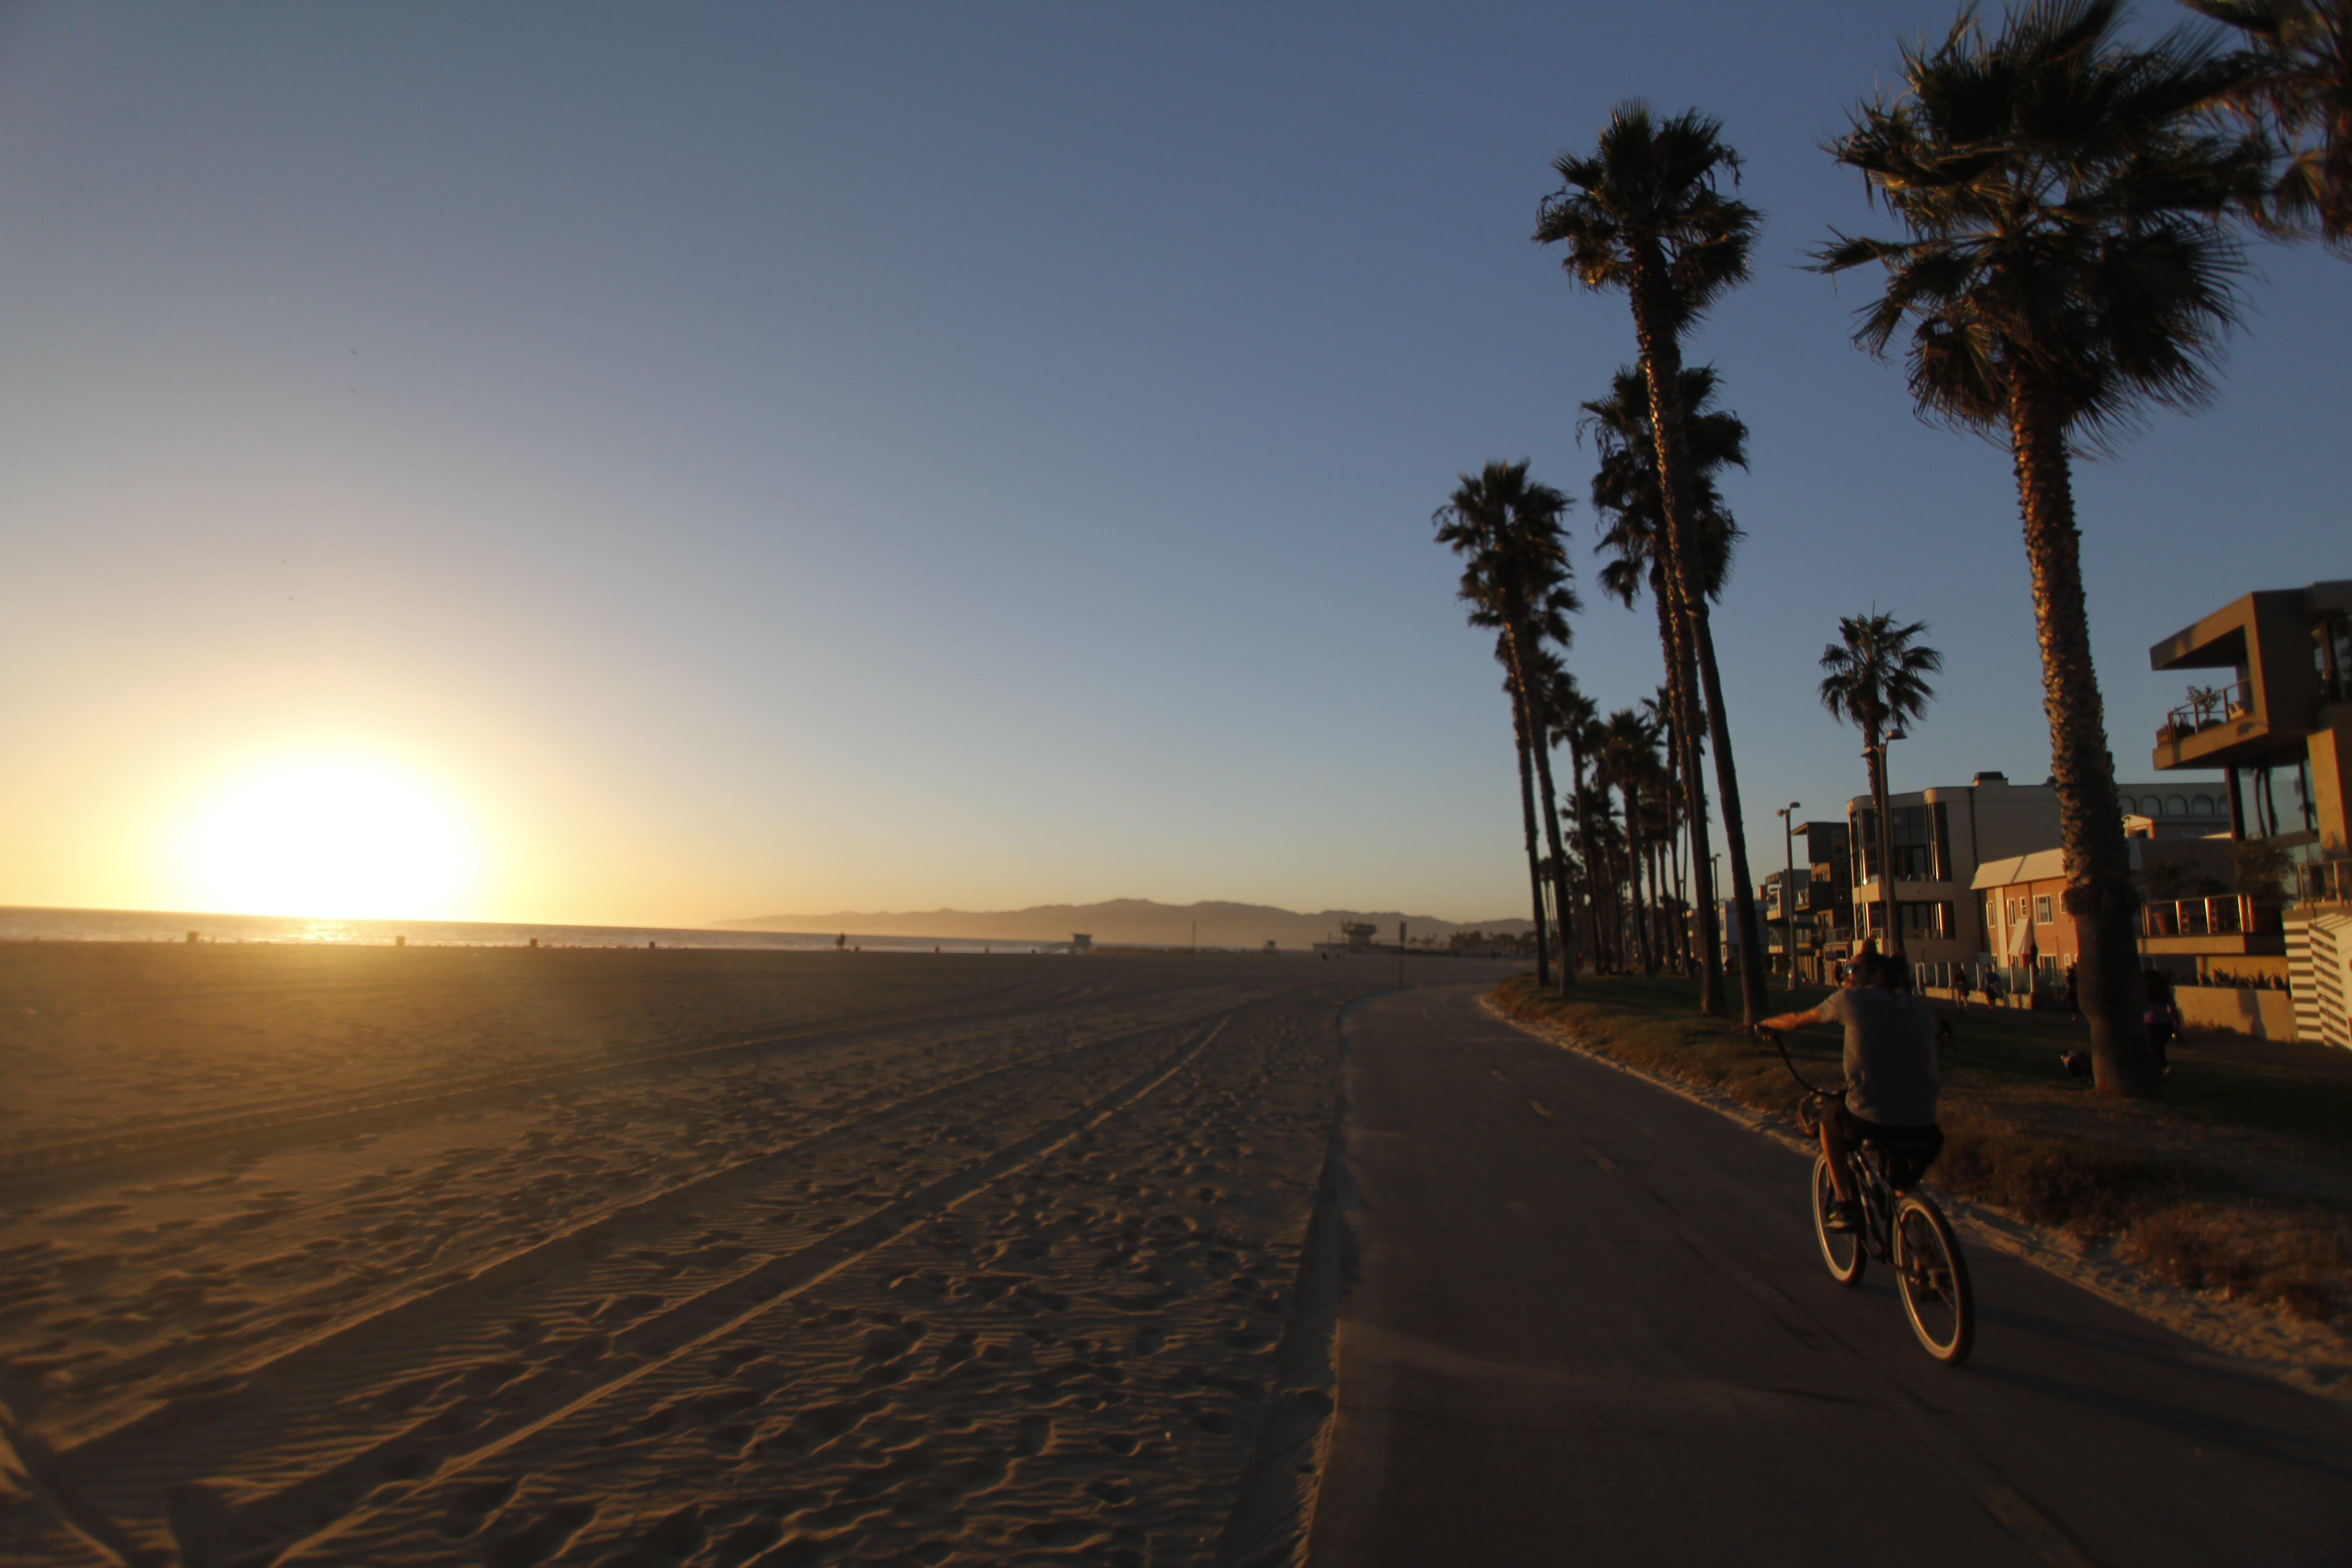 Kostenloses Stock Foto zu fahrrad, los angeles, palmen, sonnenuntergang